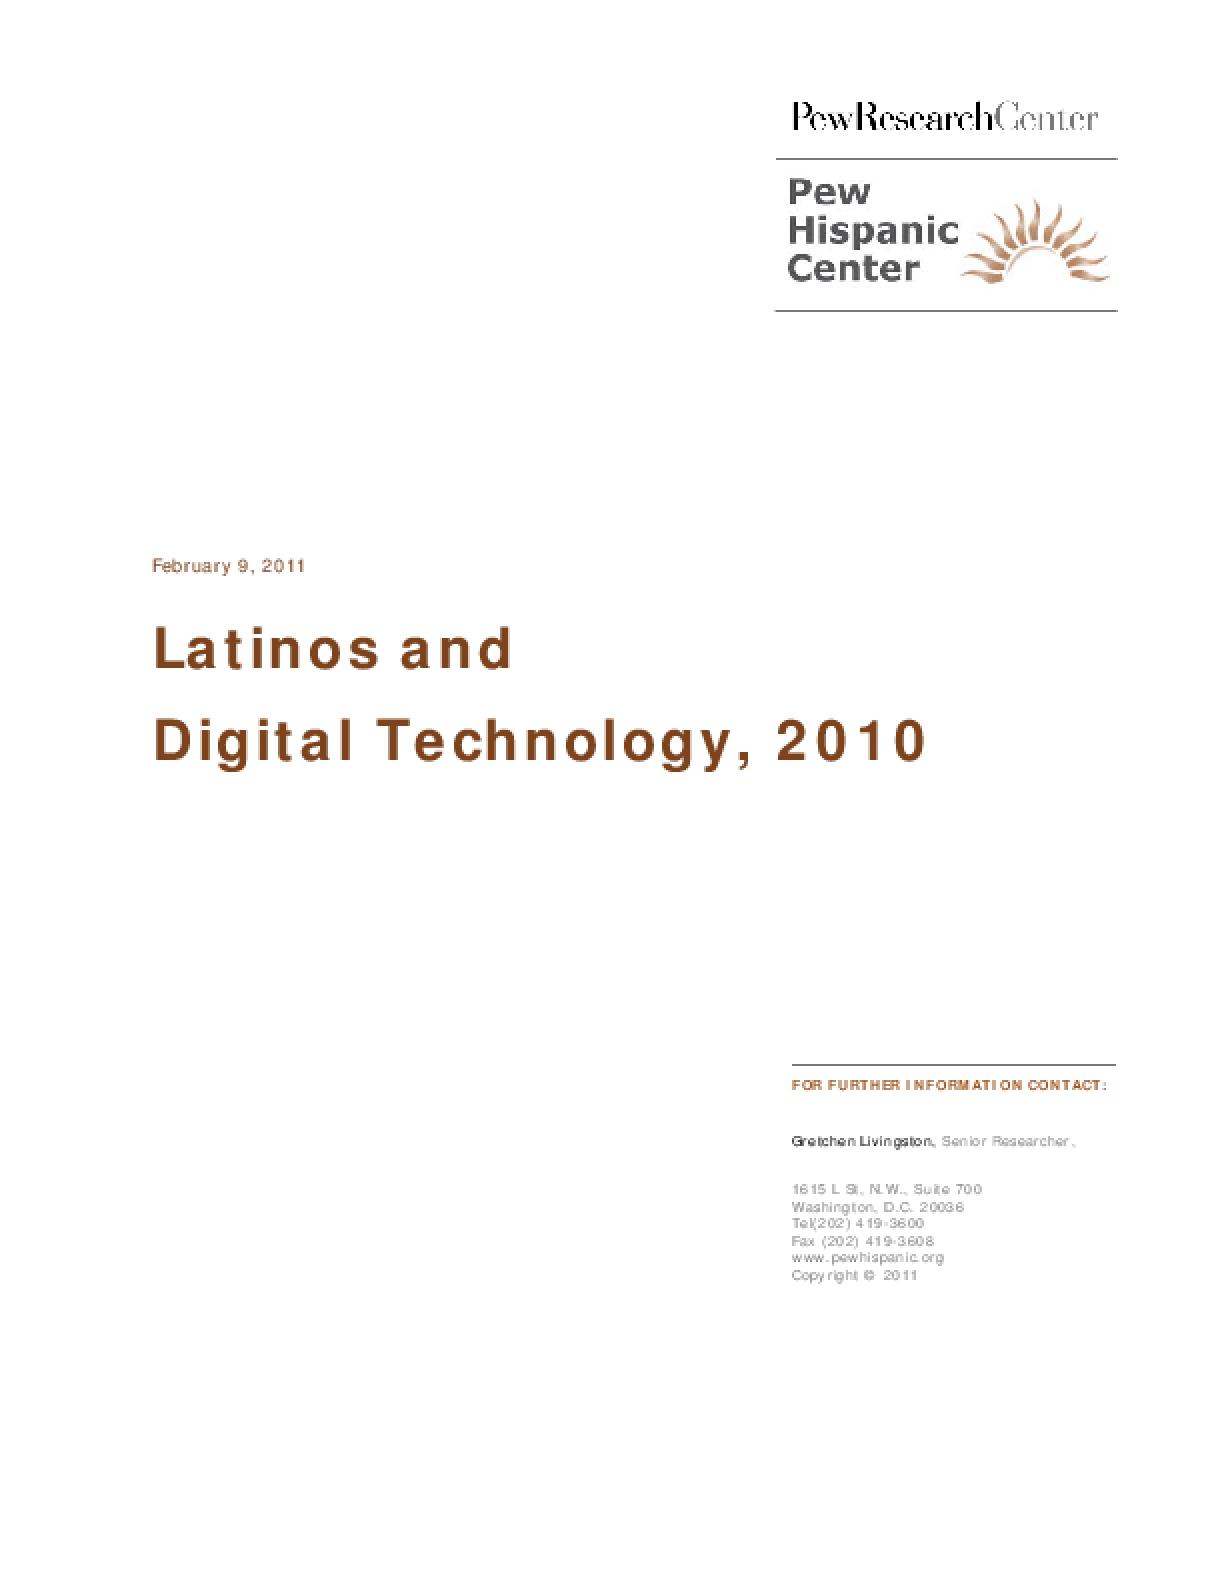 Latinos and Digital Technology, 2010